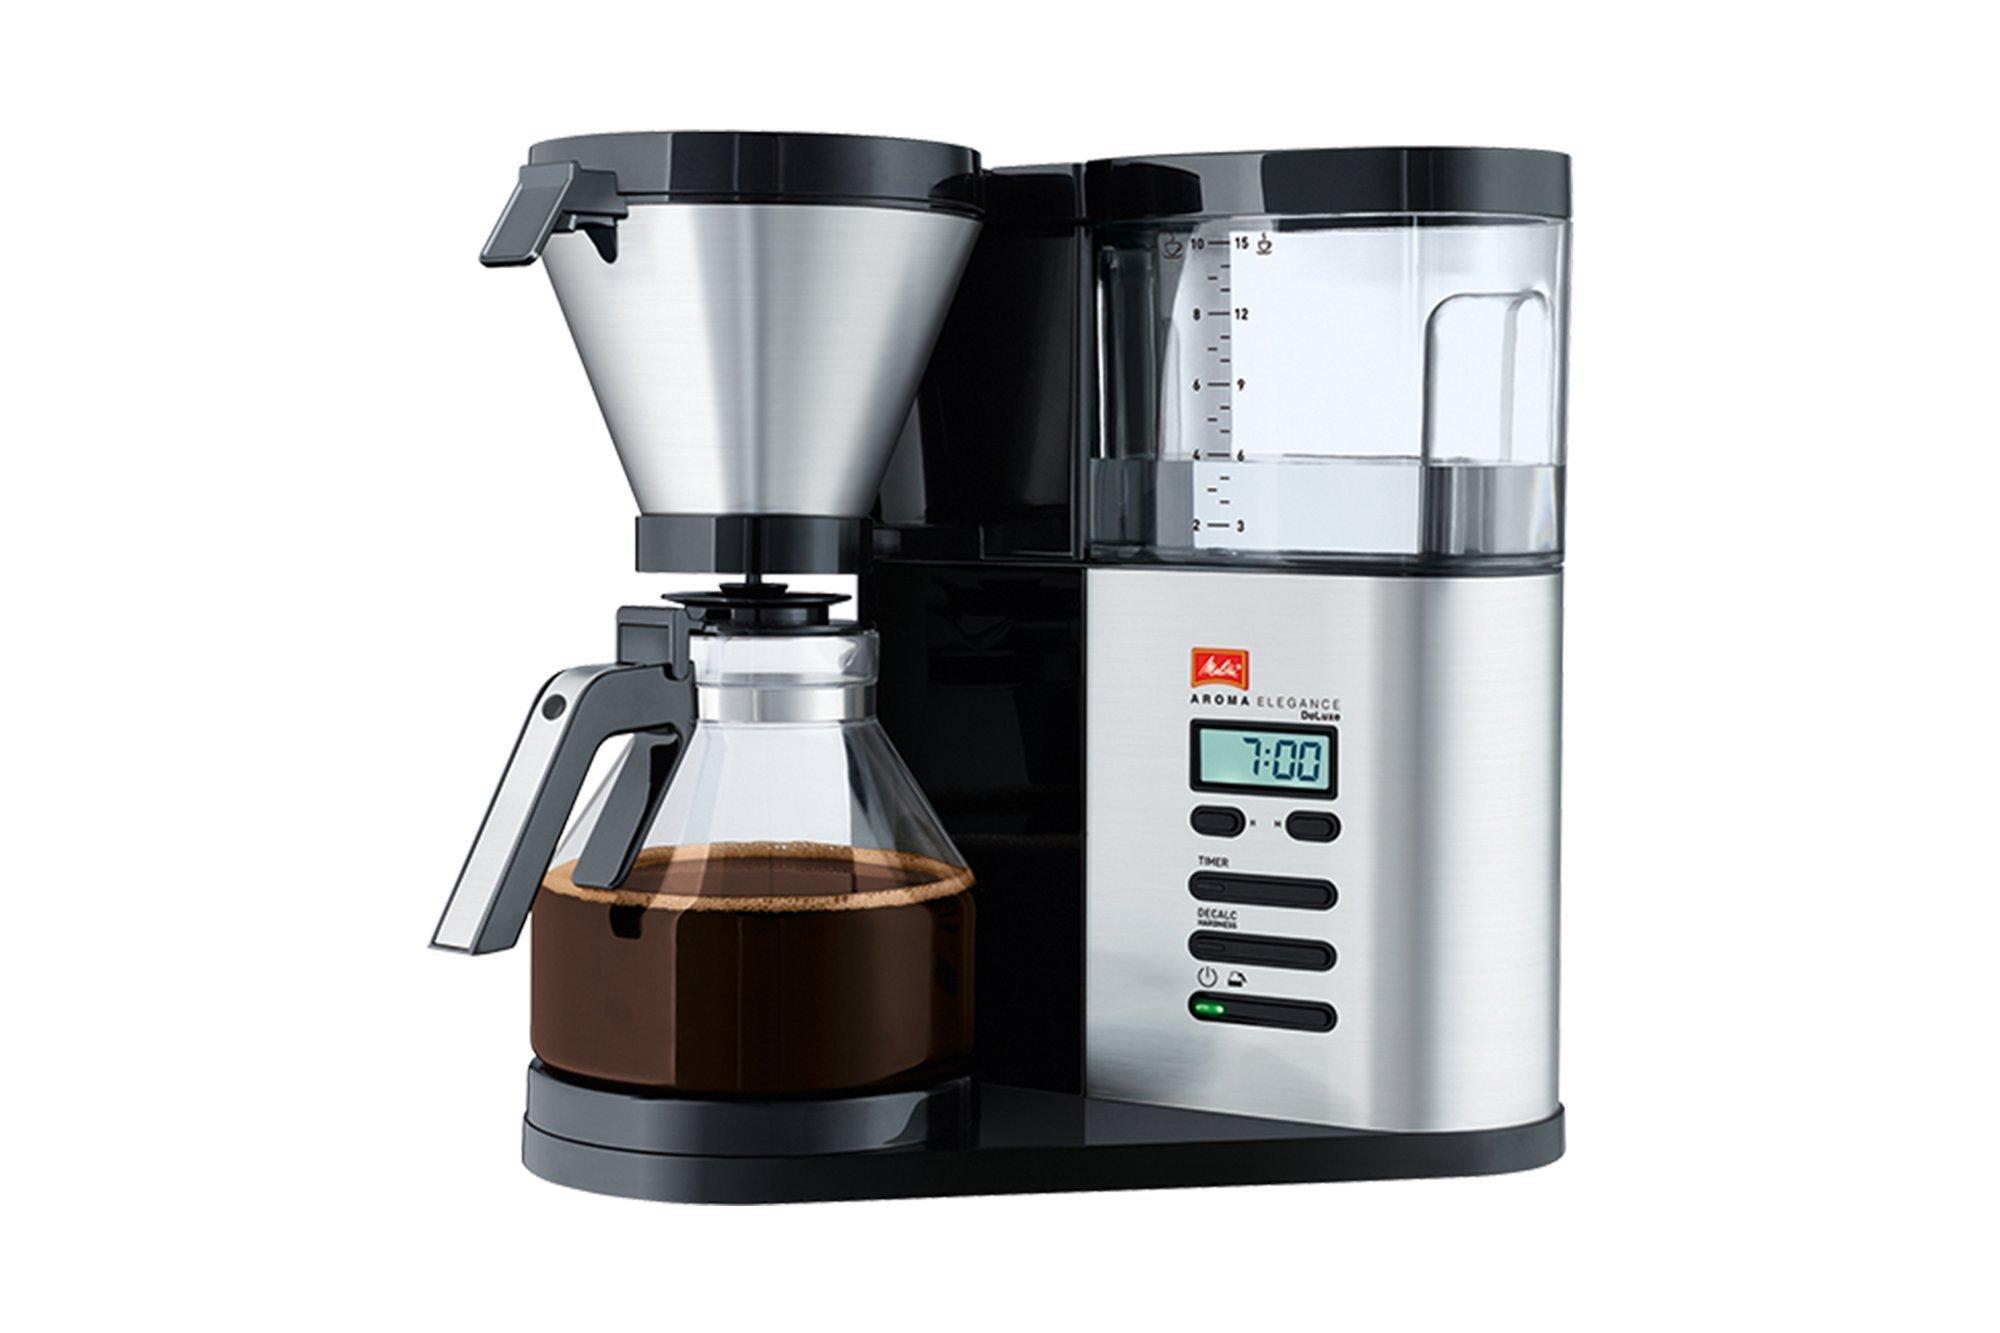 Kaffeemaschine filtern Melitta AromaElegance Deluxe 1012-03 1.2l 1520W